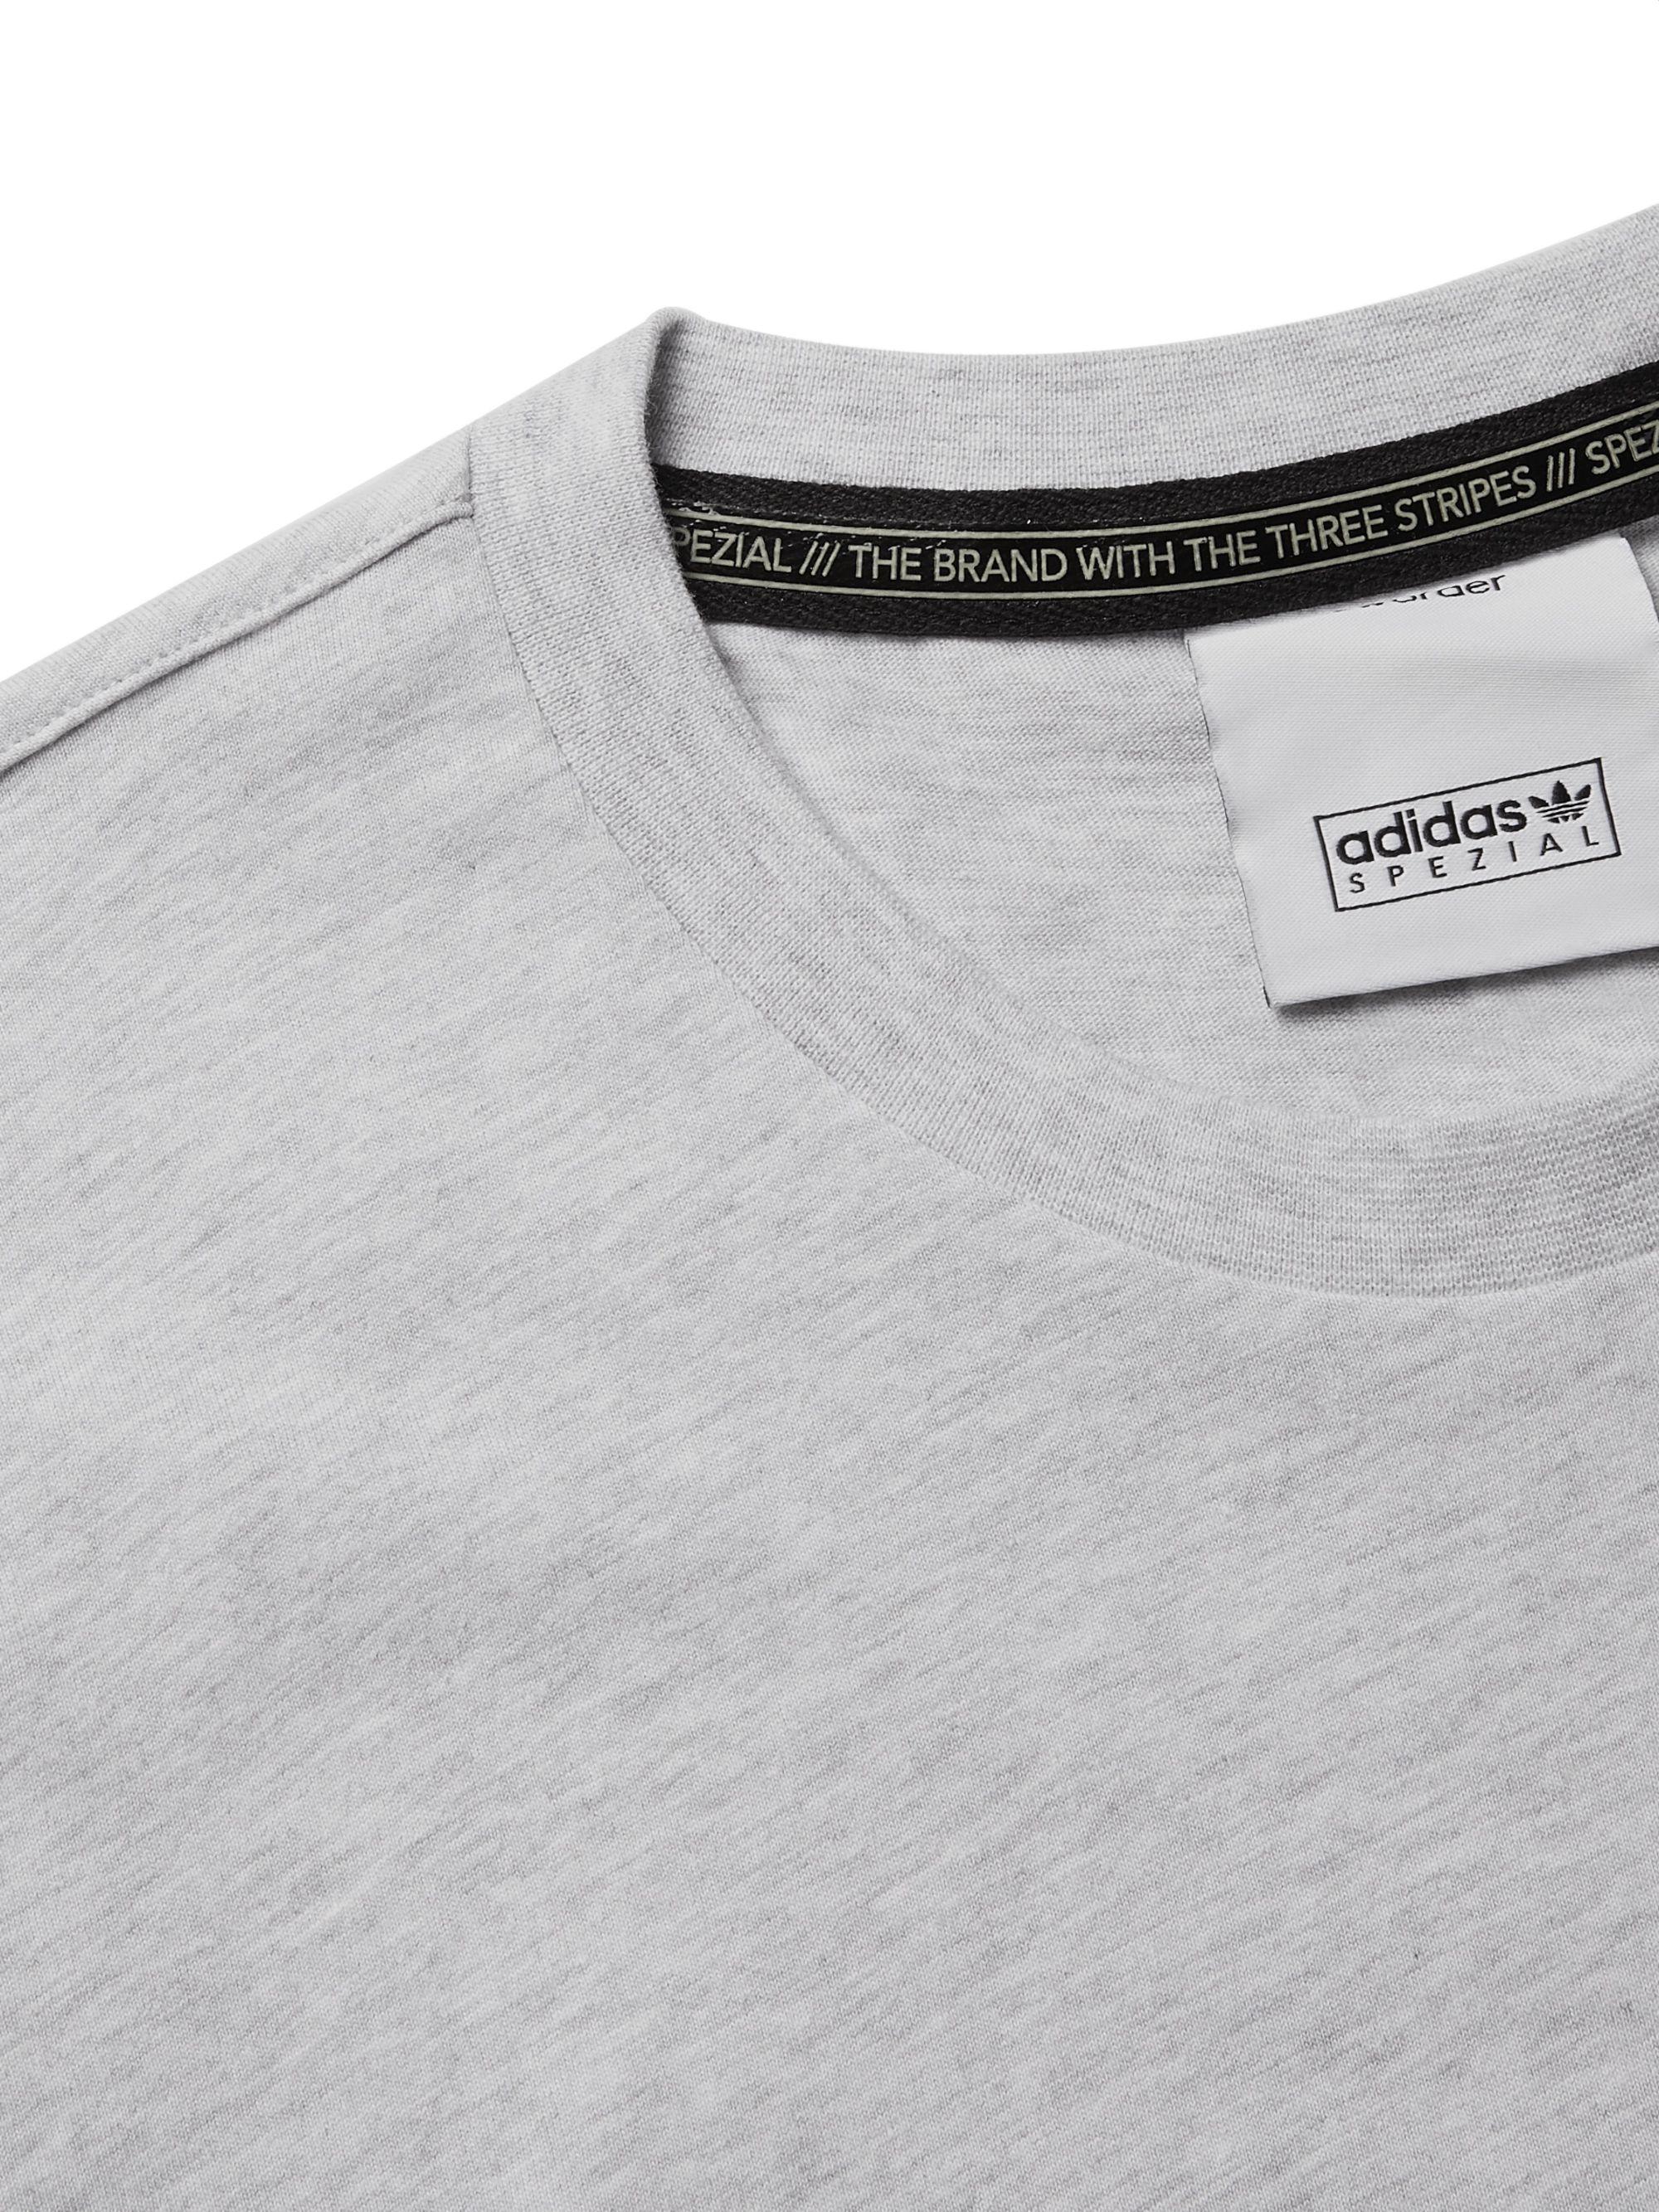 Gray + New Order Spezial Printed Cotton-jersey T-shirt | Adidas Consortium